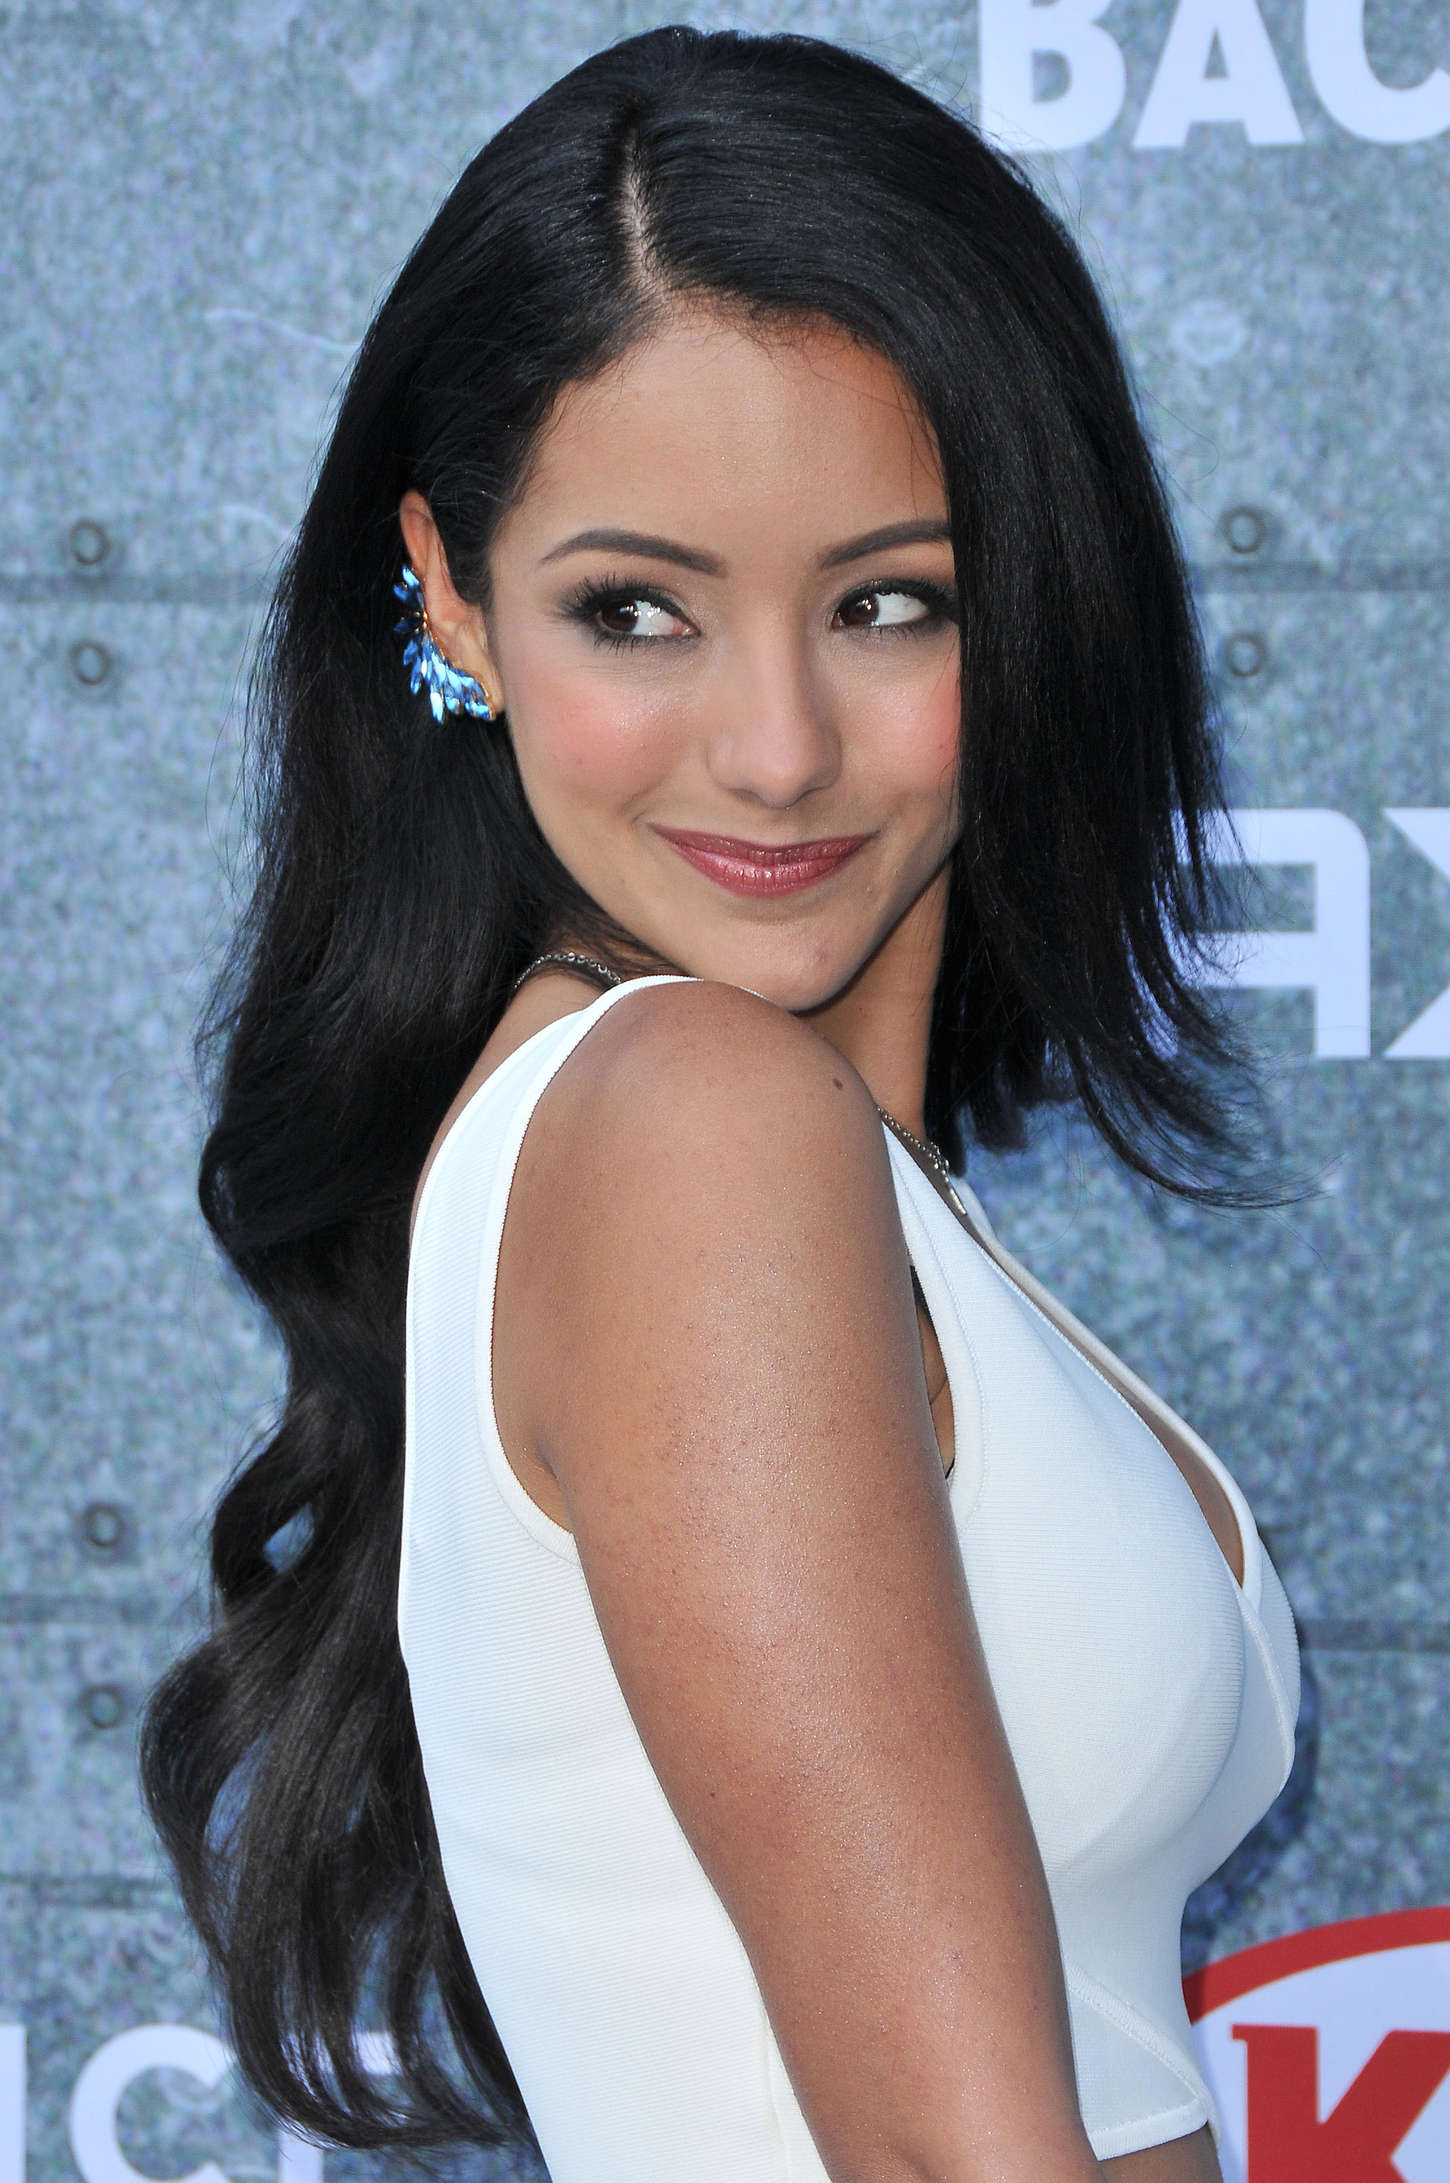 Melanie Iglesias 2015 : Melanie Iglesias: Spike TVs Guys Choice 2015 -05